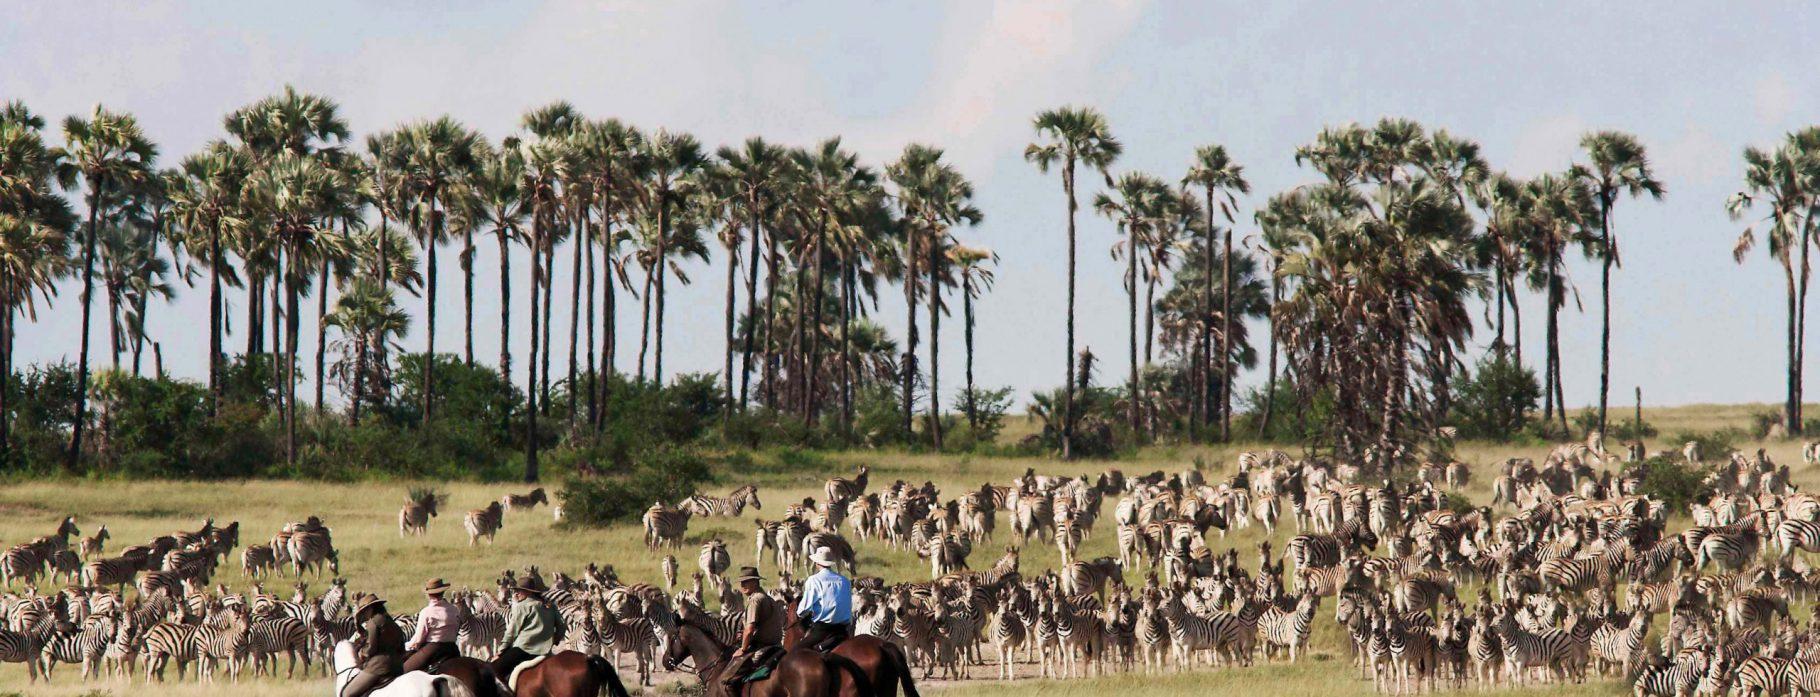 11 DAYS EXCLUSIVE WINGS OVER BOTSWANA